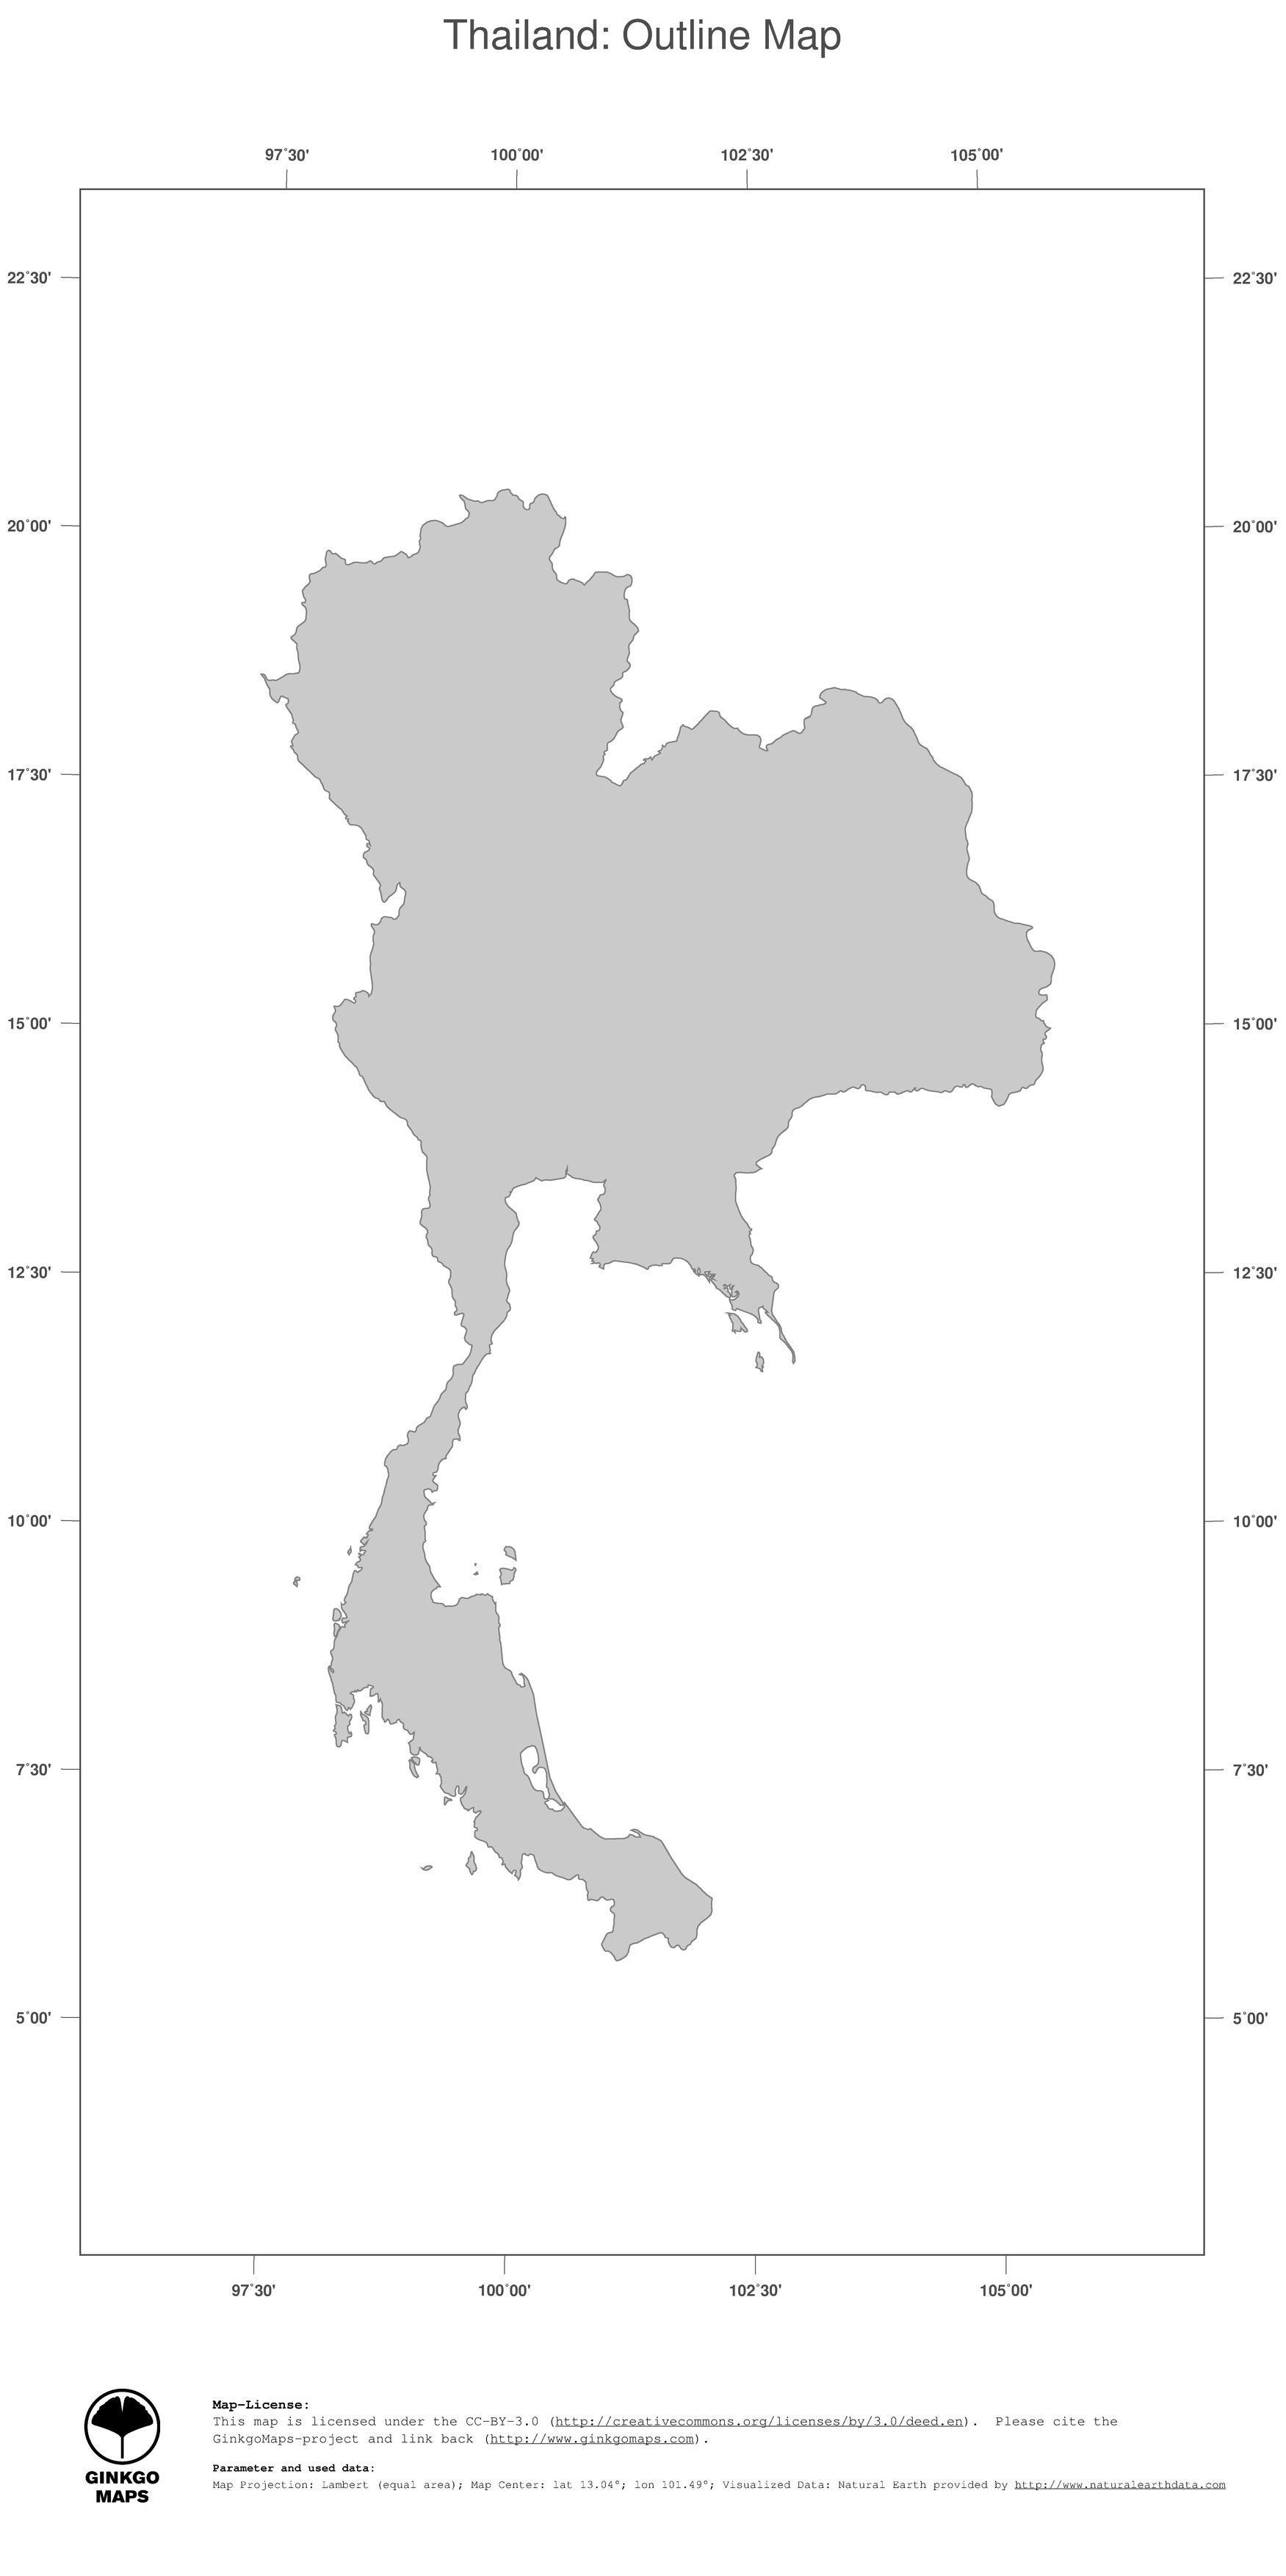 rl3c th thailand map plaindcw ja hres jpgThailand Map Outline